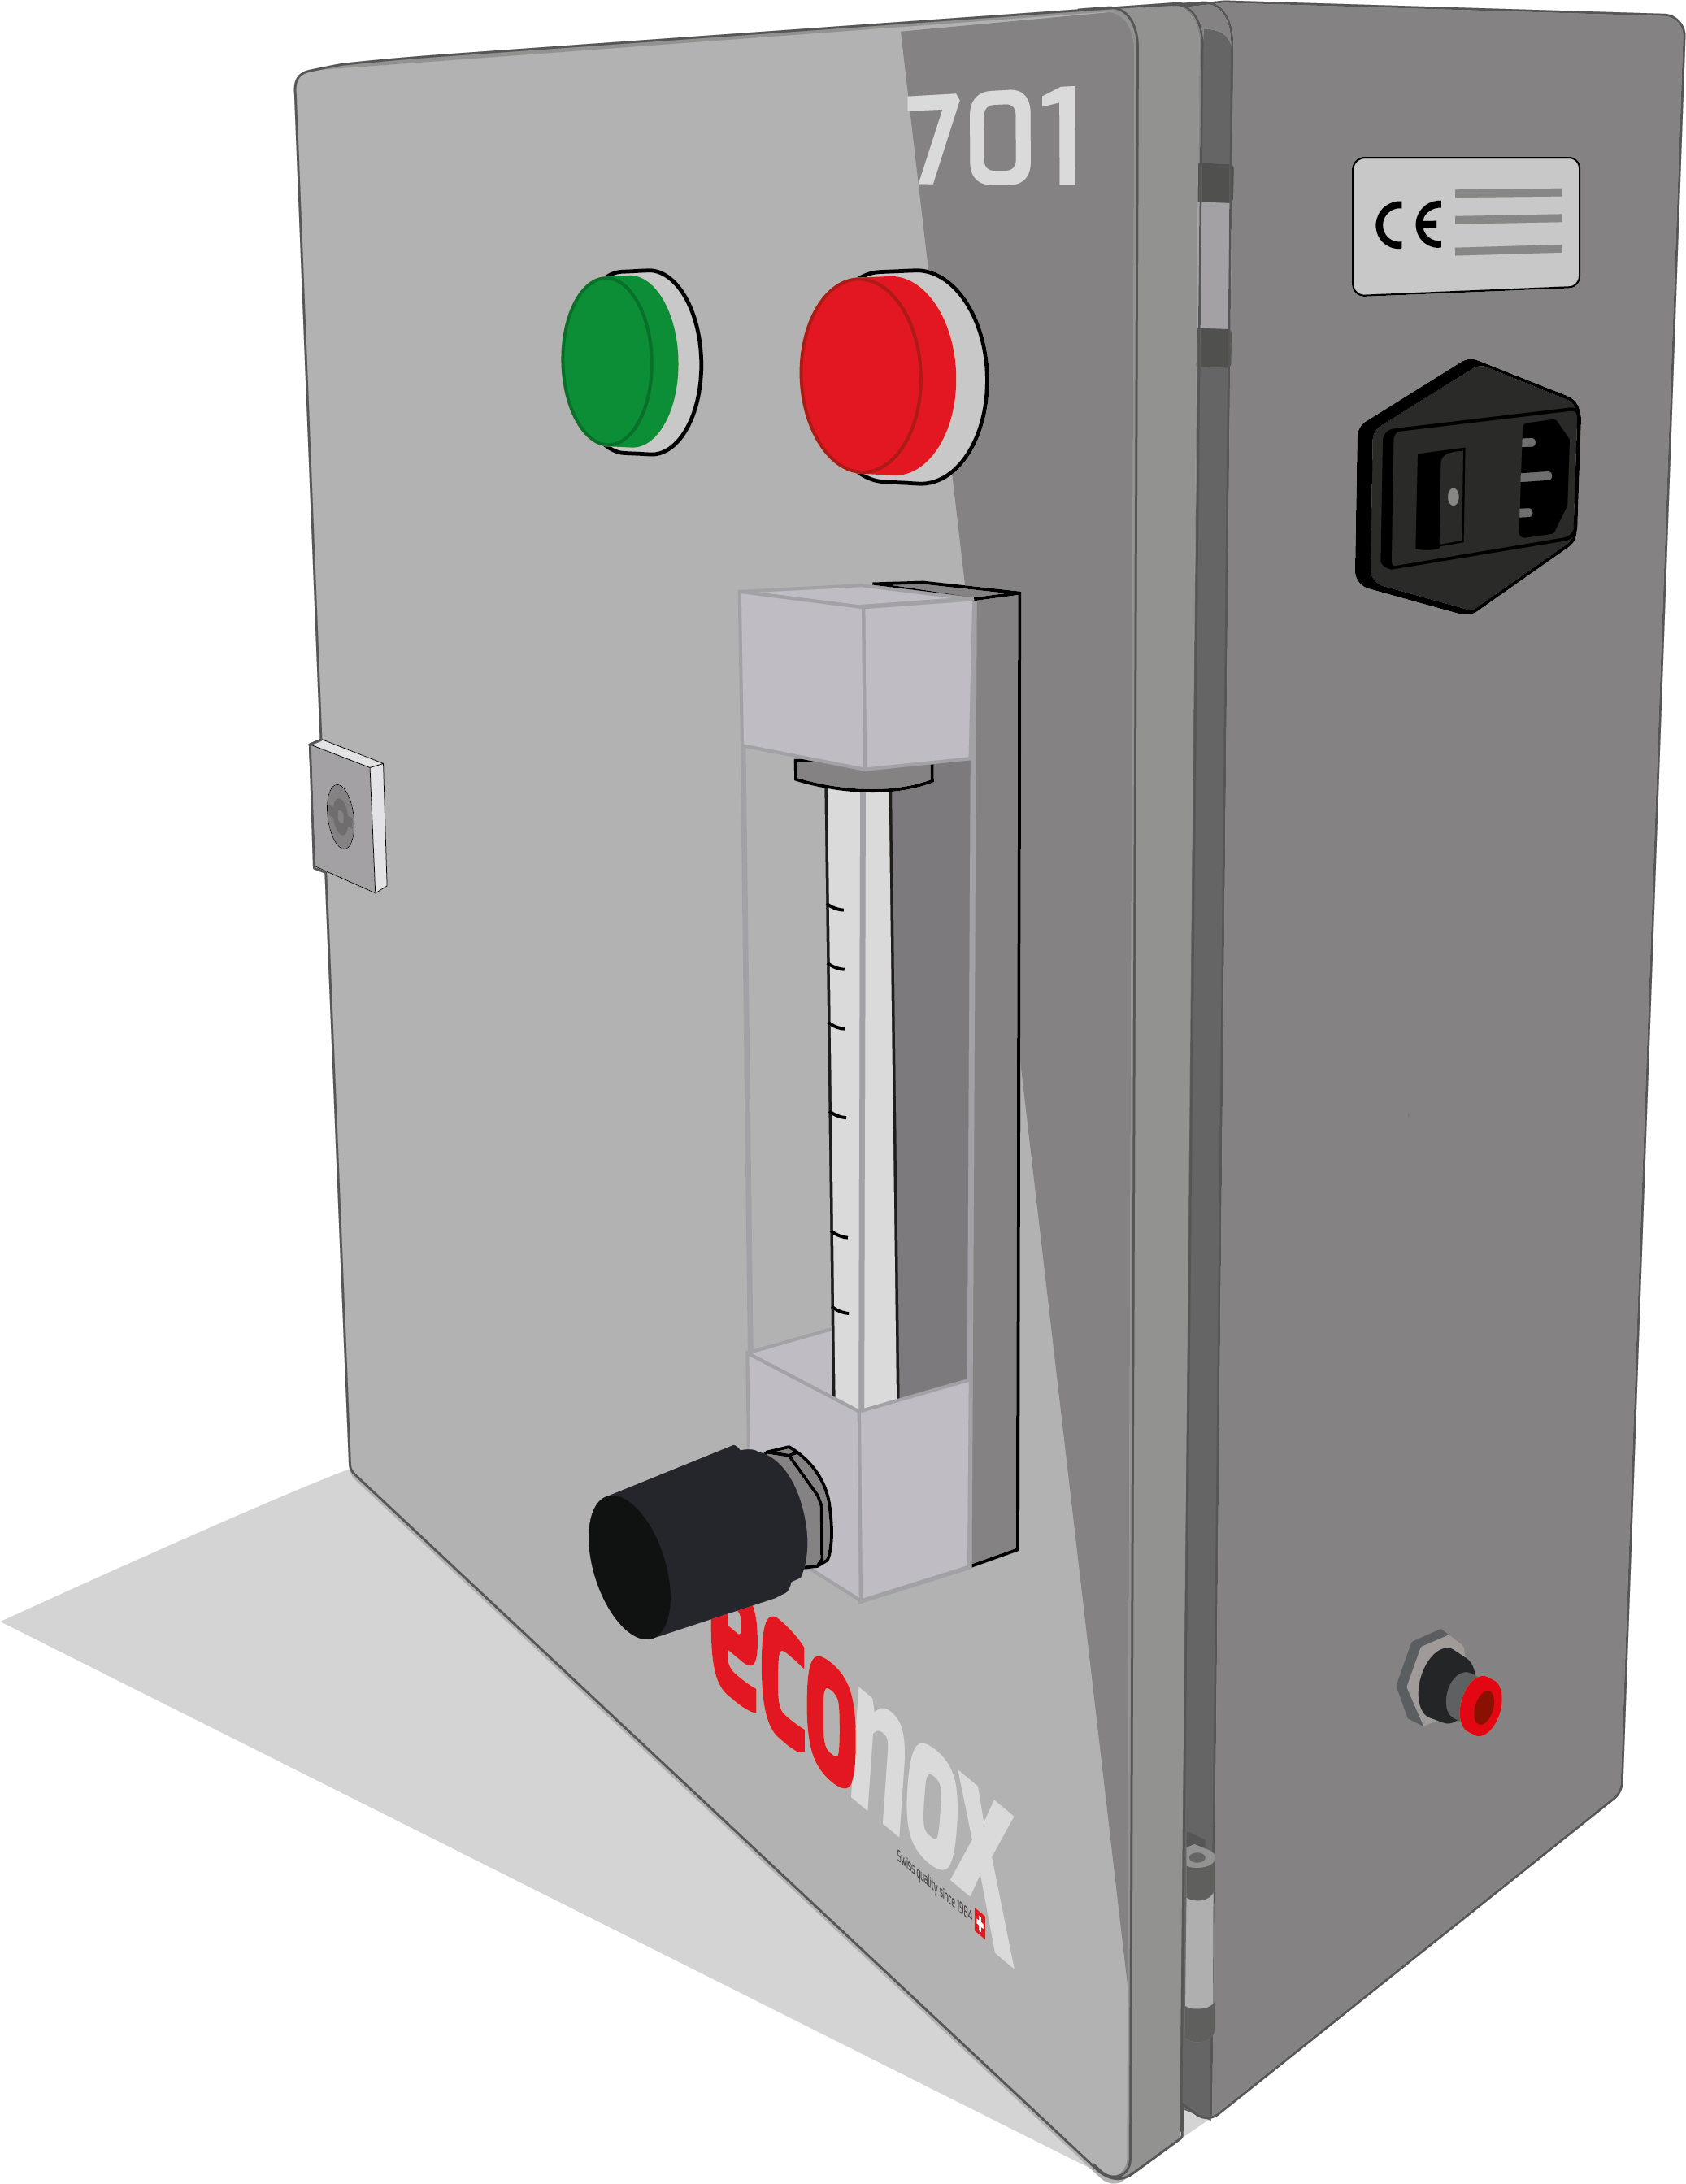 Module de maintenance 701